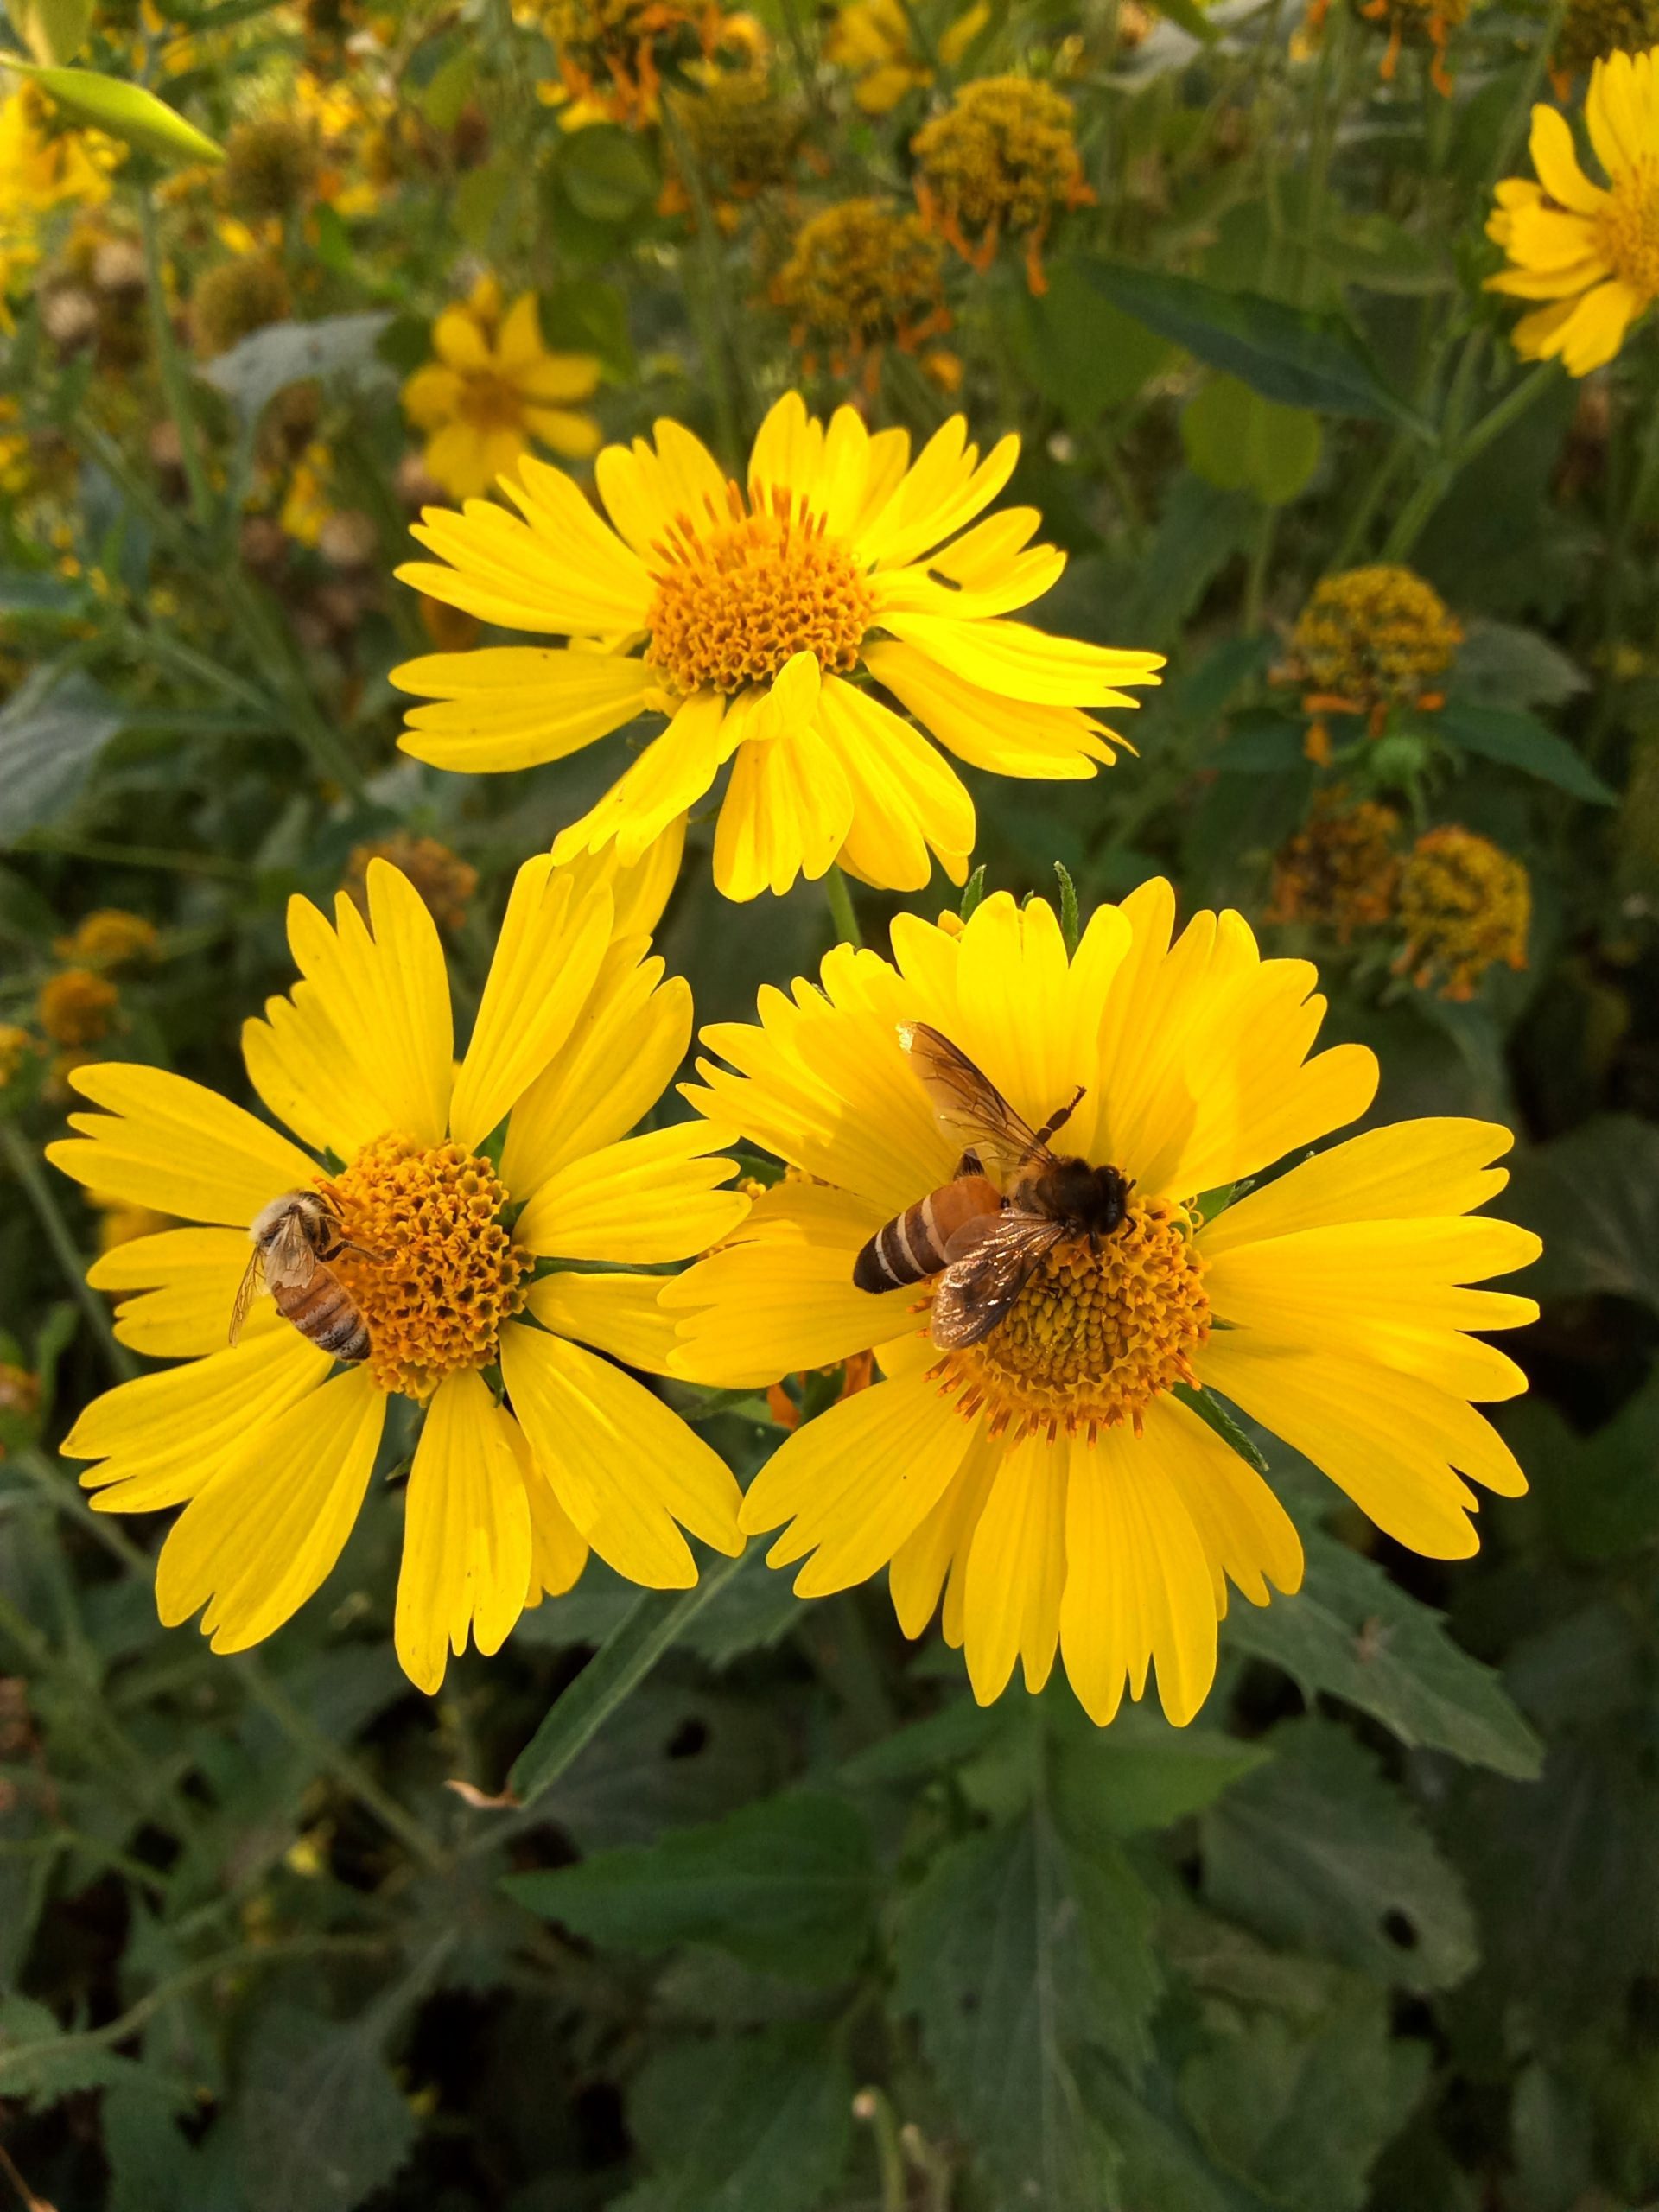 Honeybees on sunflowers